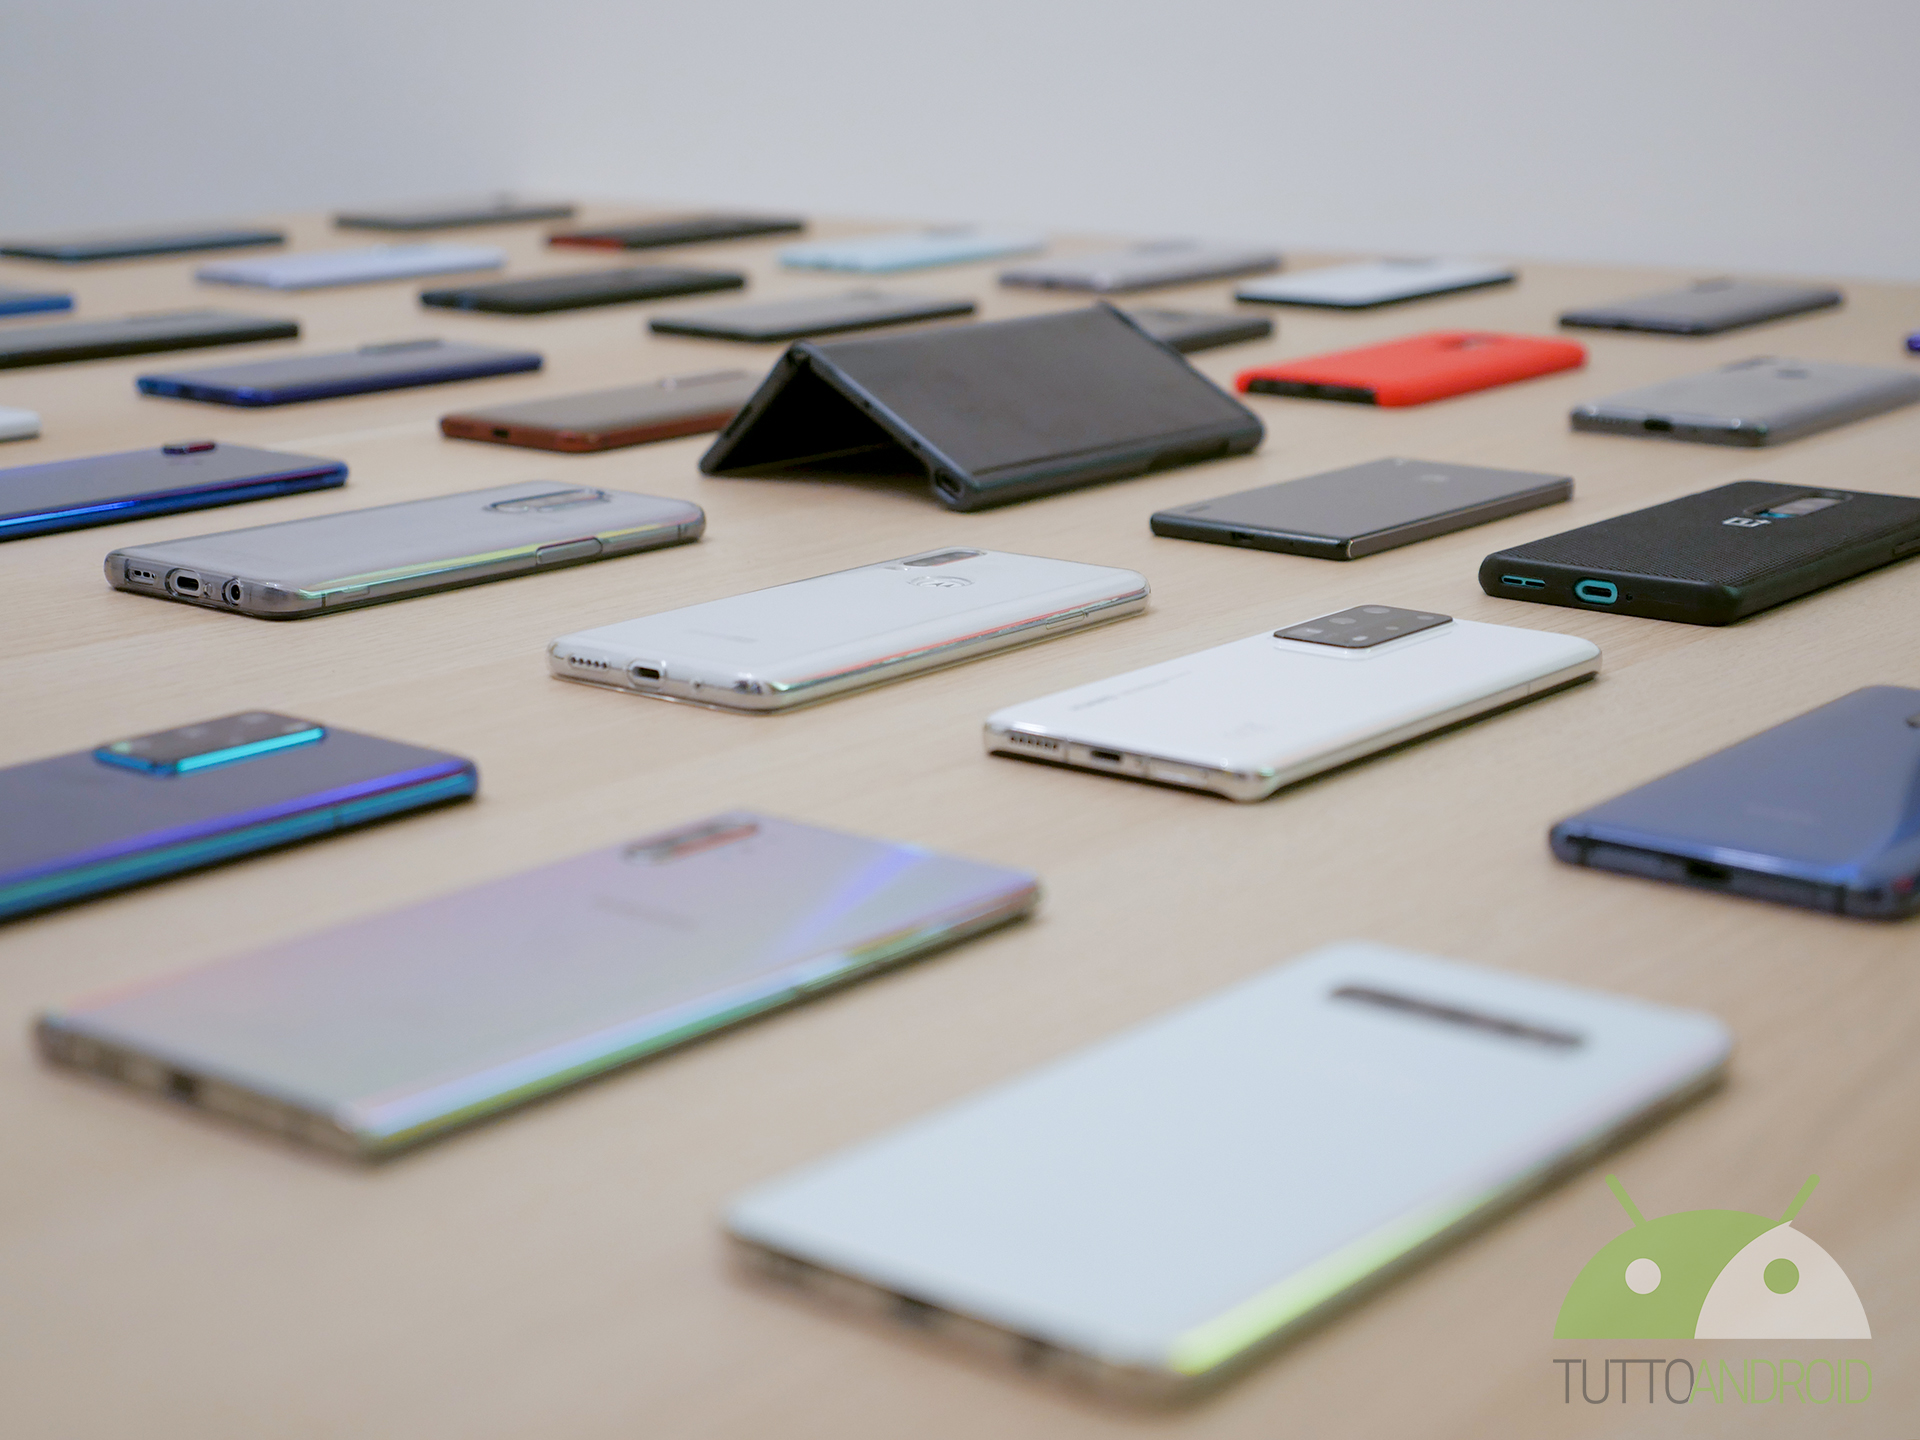 Settimana di fuoco in arrivo: Apple, Google, Samsung, Huawei… quanti eventi!